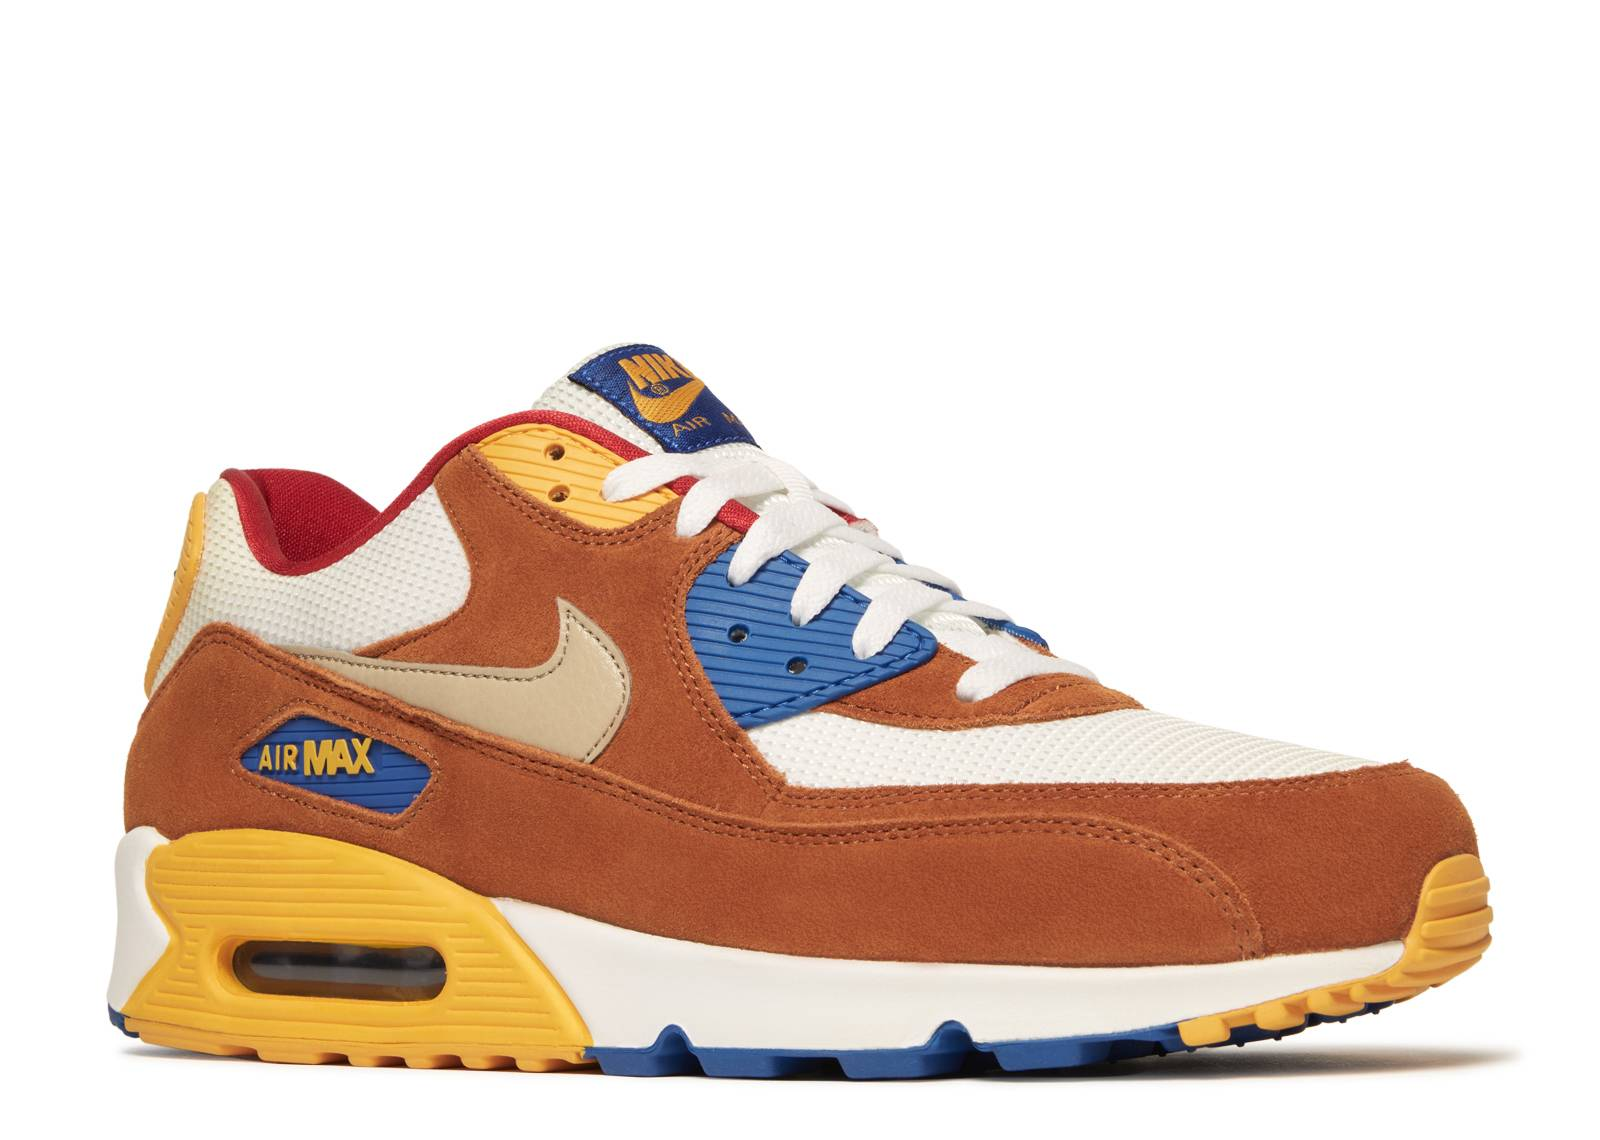 premium selection 86ed7 c8505 ... Curry air max 90 prm Nike ...